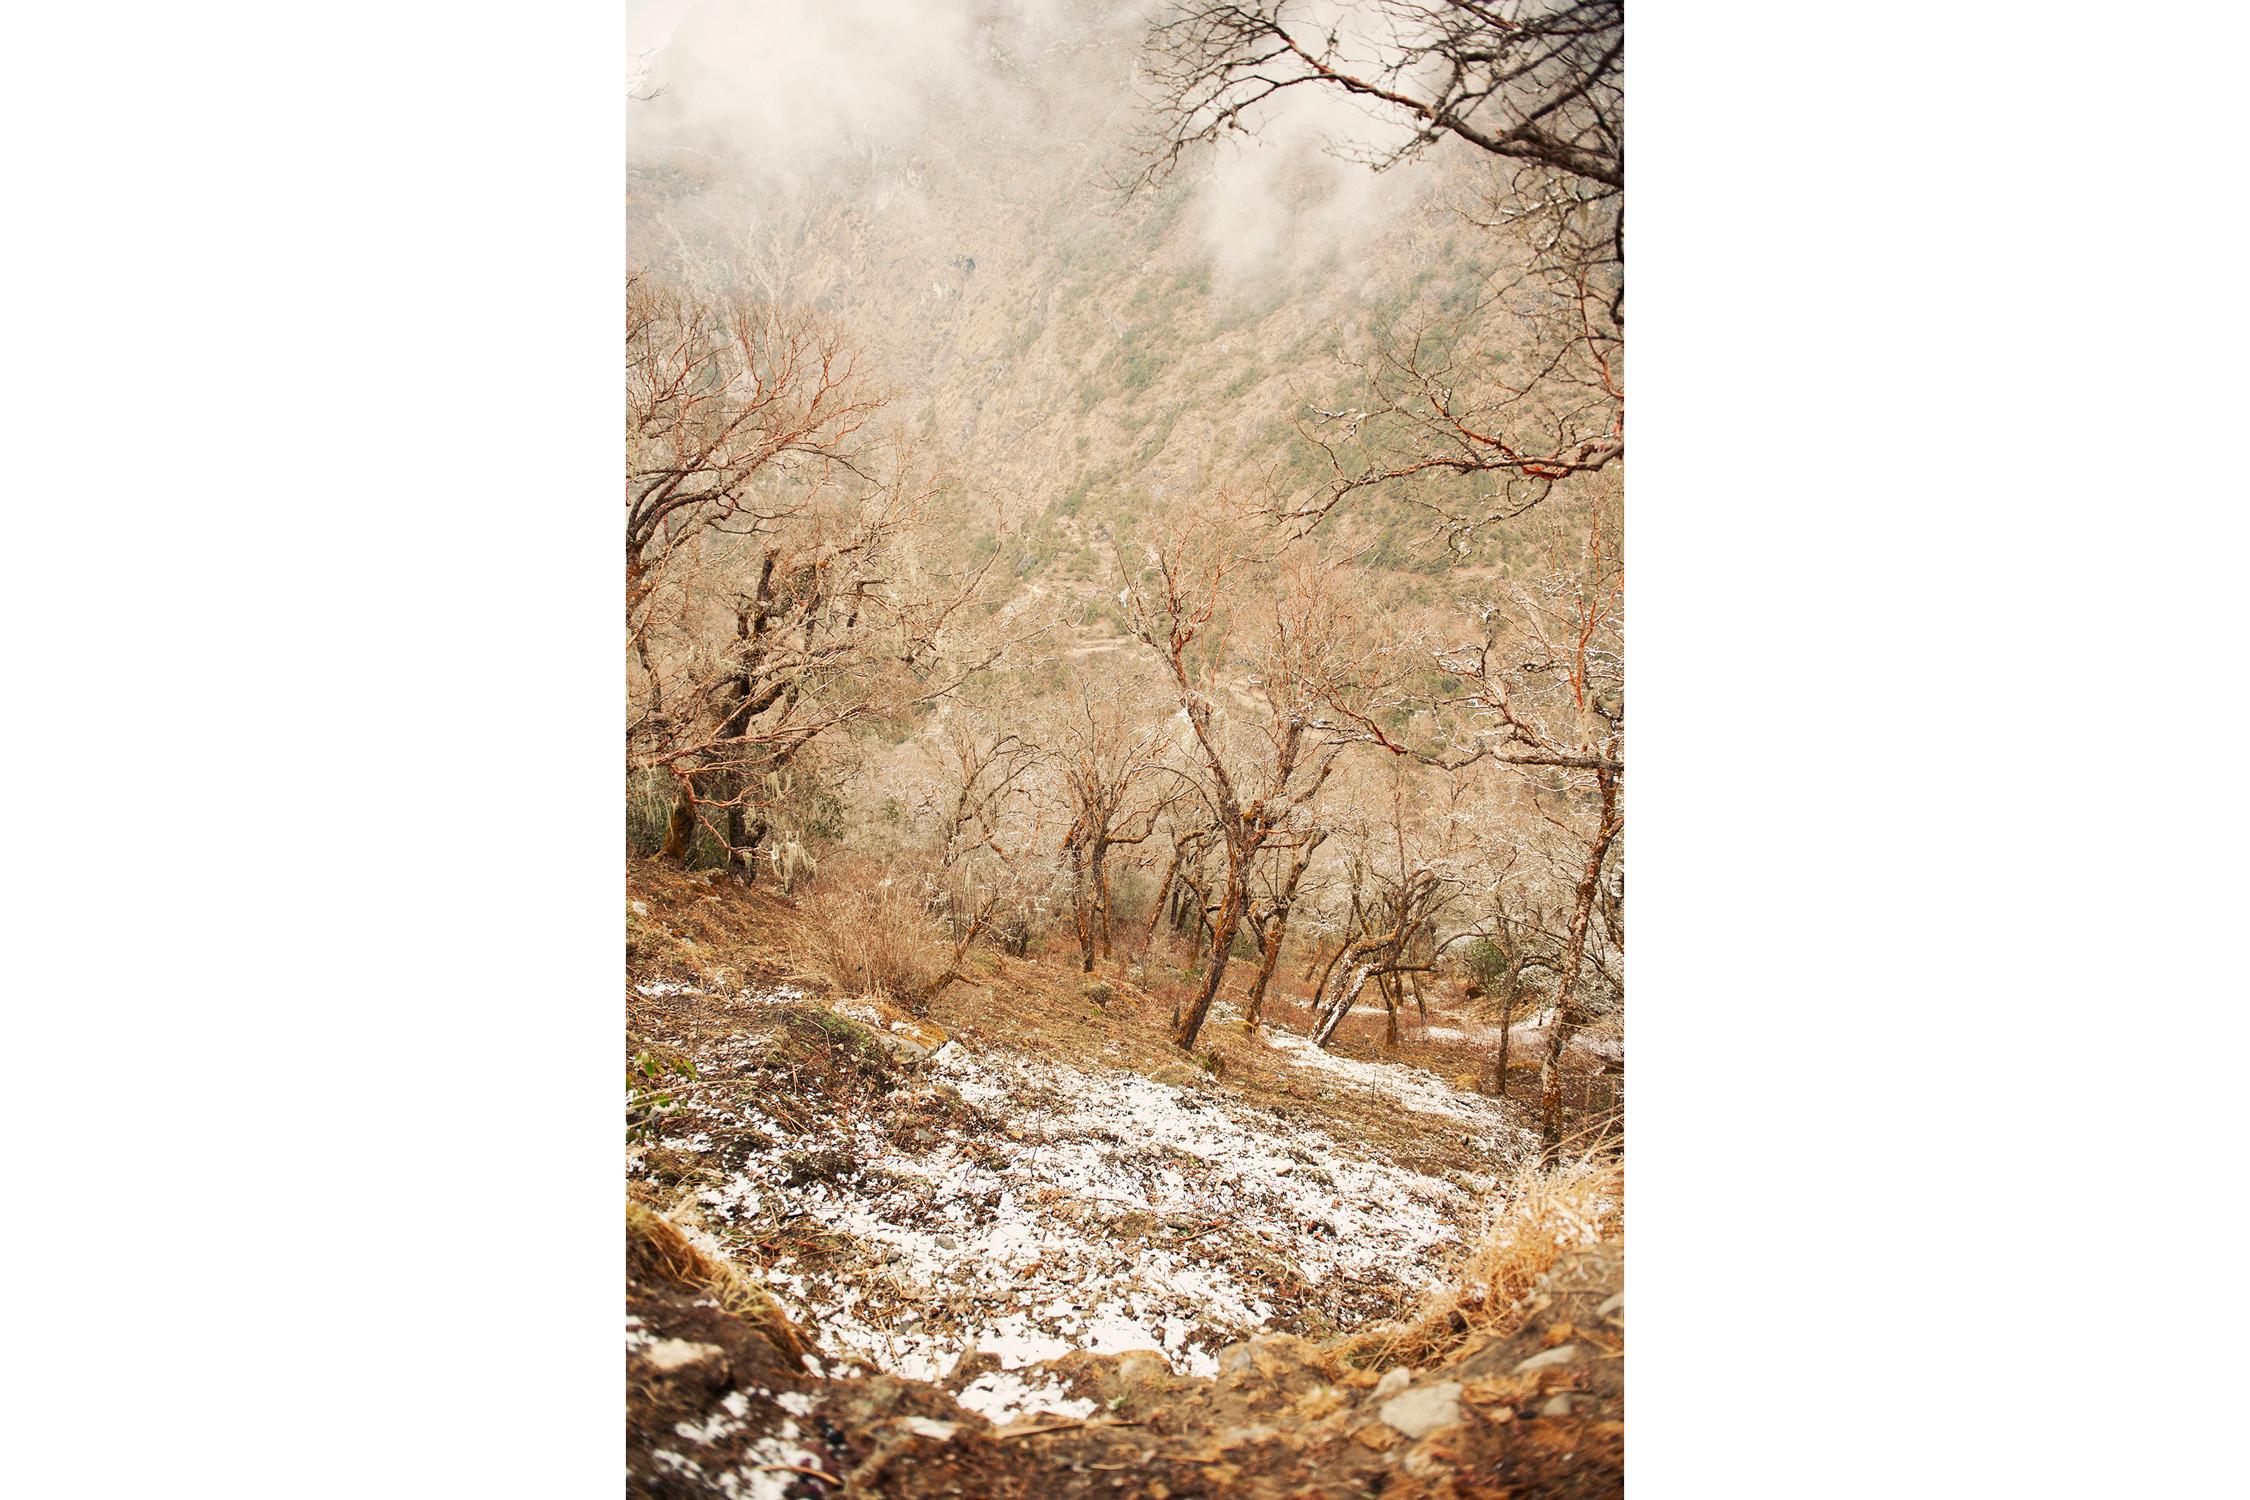 Katie_Mitchell_Photography_India_Mongolia_Worldwide_Travel_Photographer_18.jpg